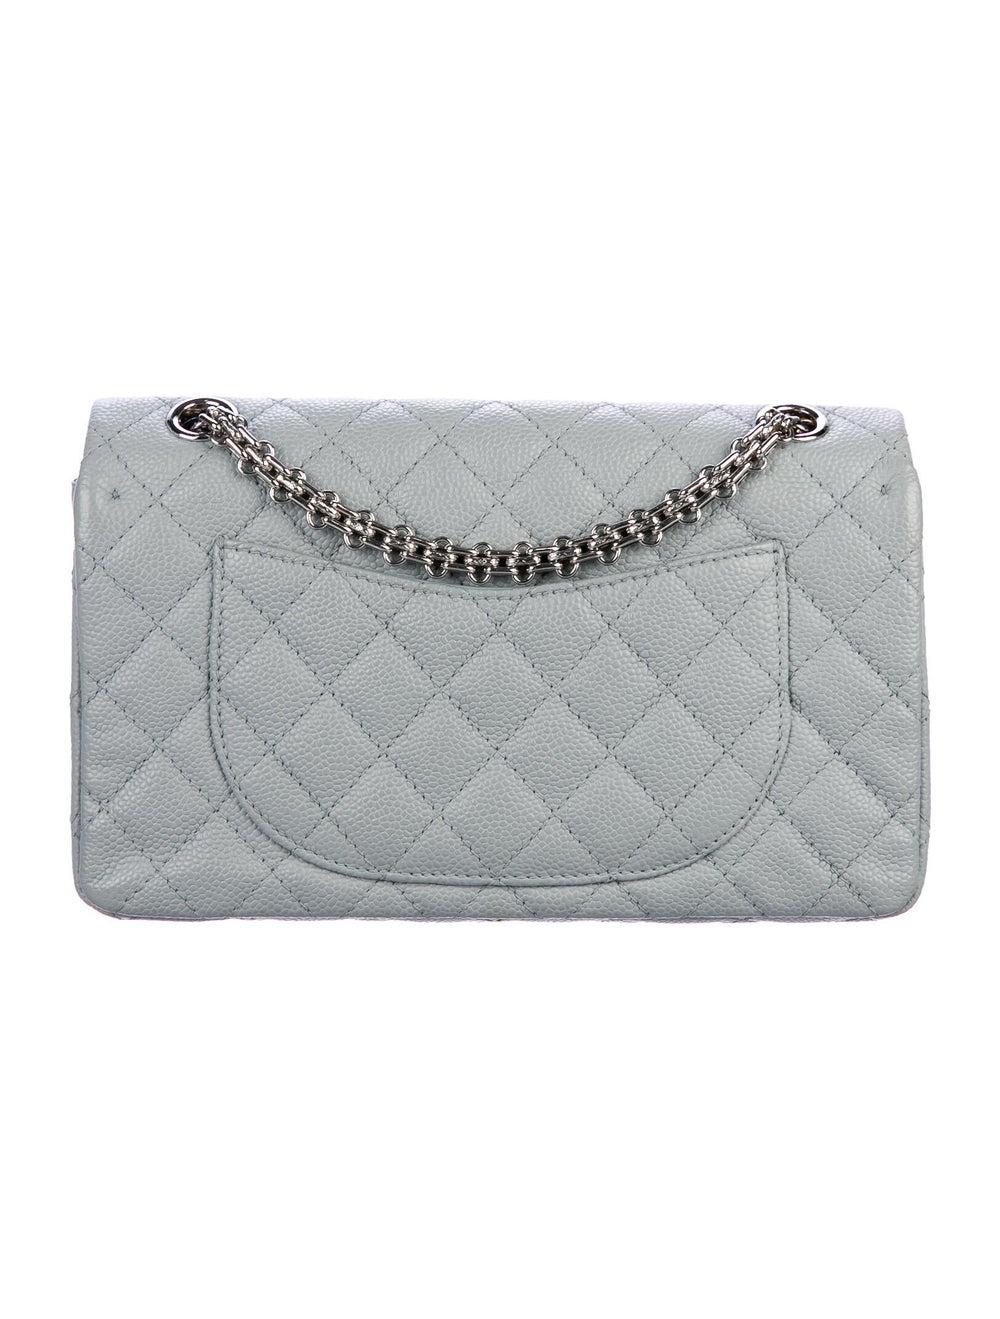 Chanel Reissue 225 Double Flap Bag Blue - image 4